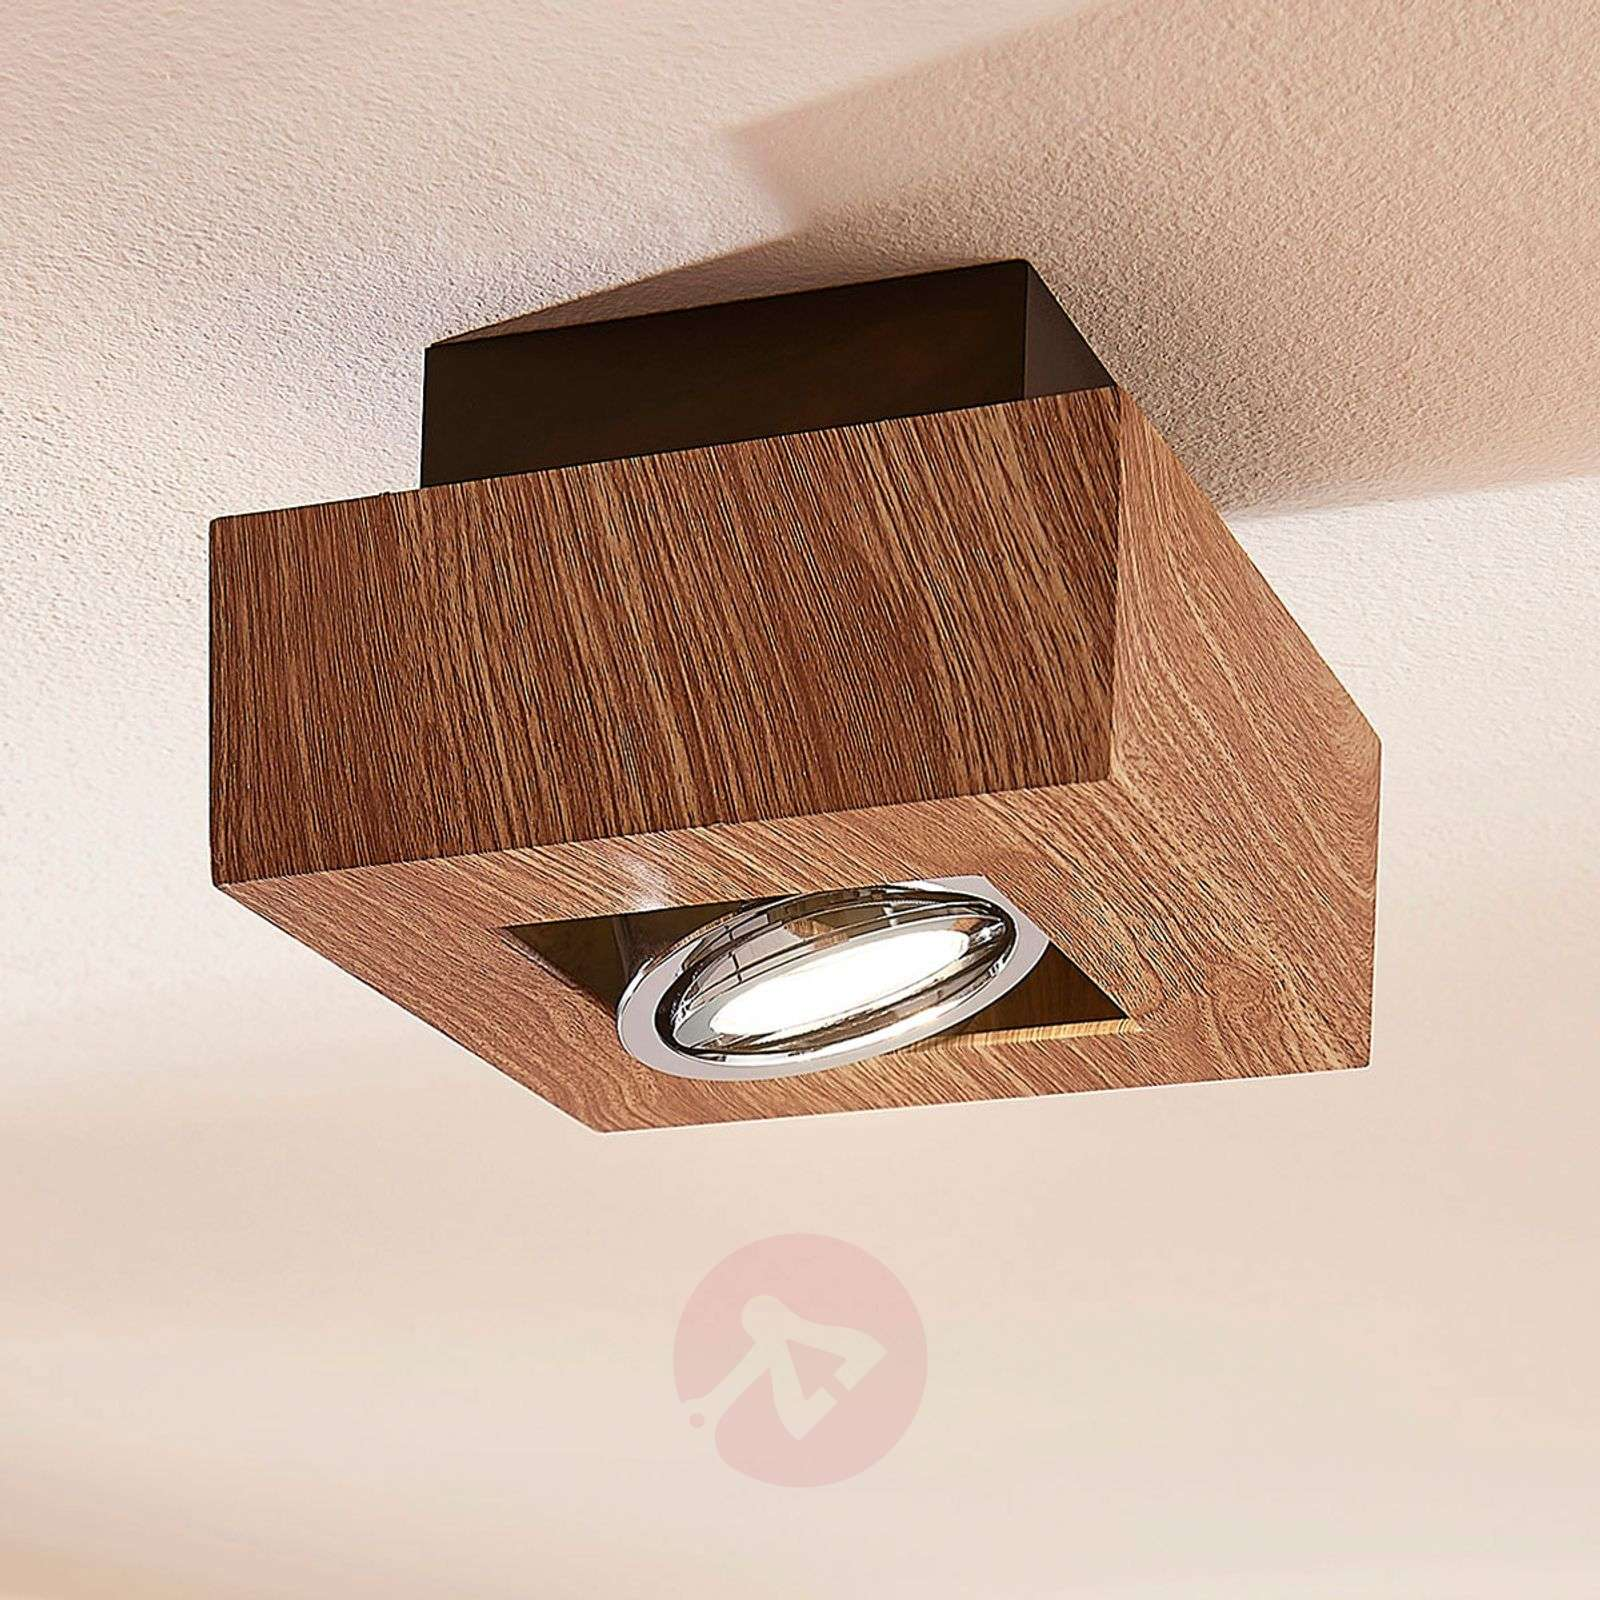 LED-kattolamppu Vince, 14 x 14 cm puuta-9621712-01